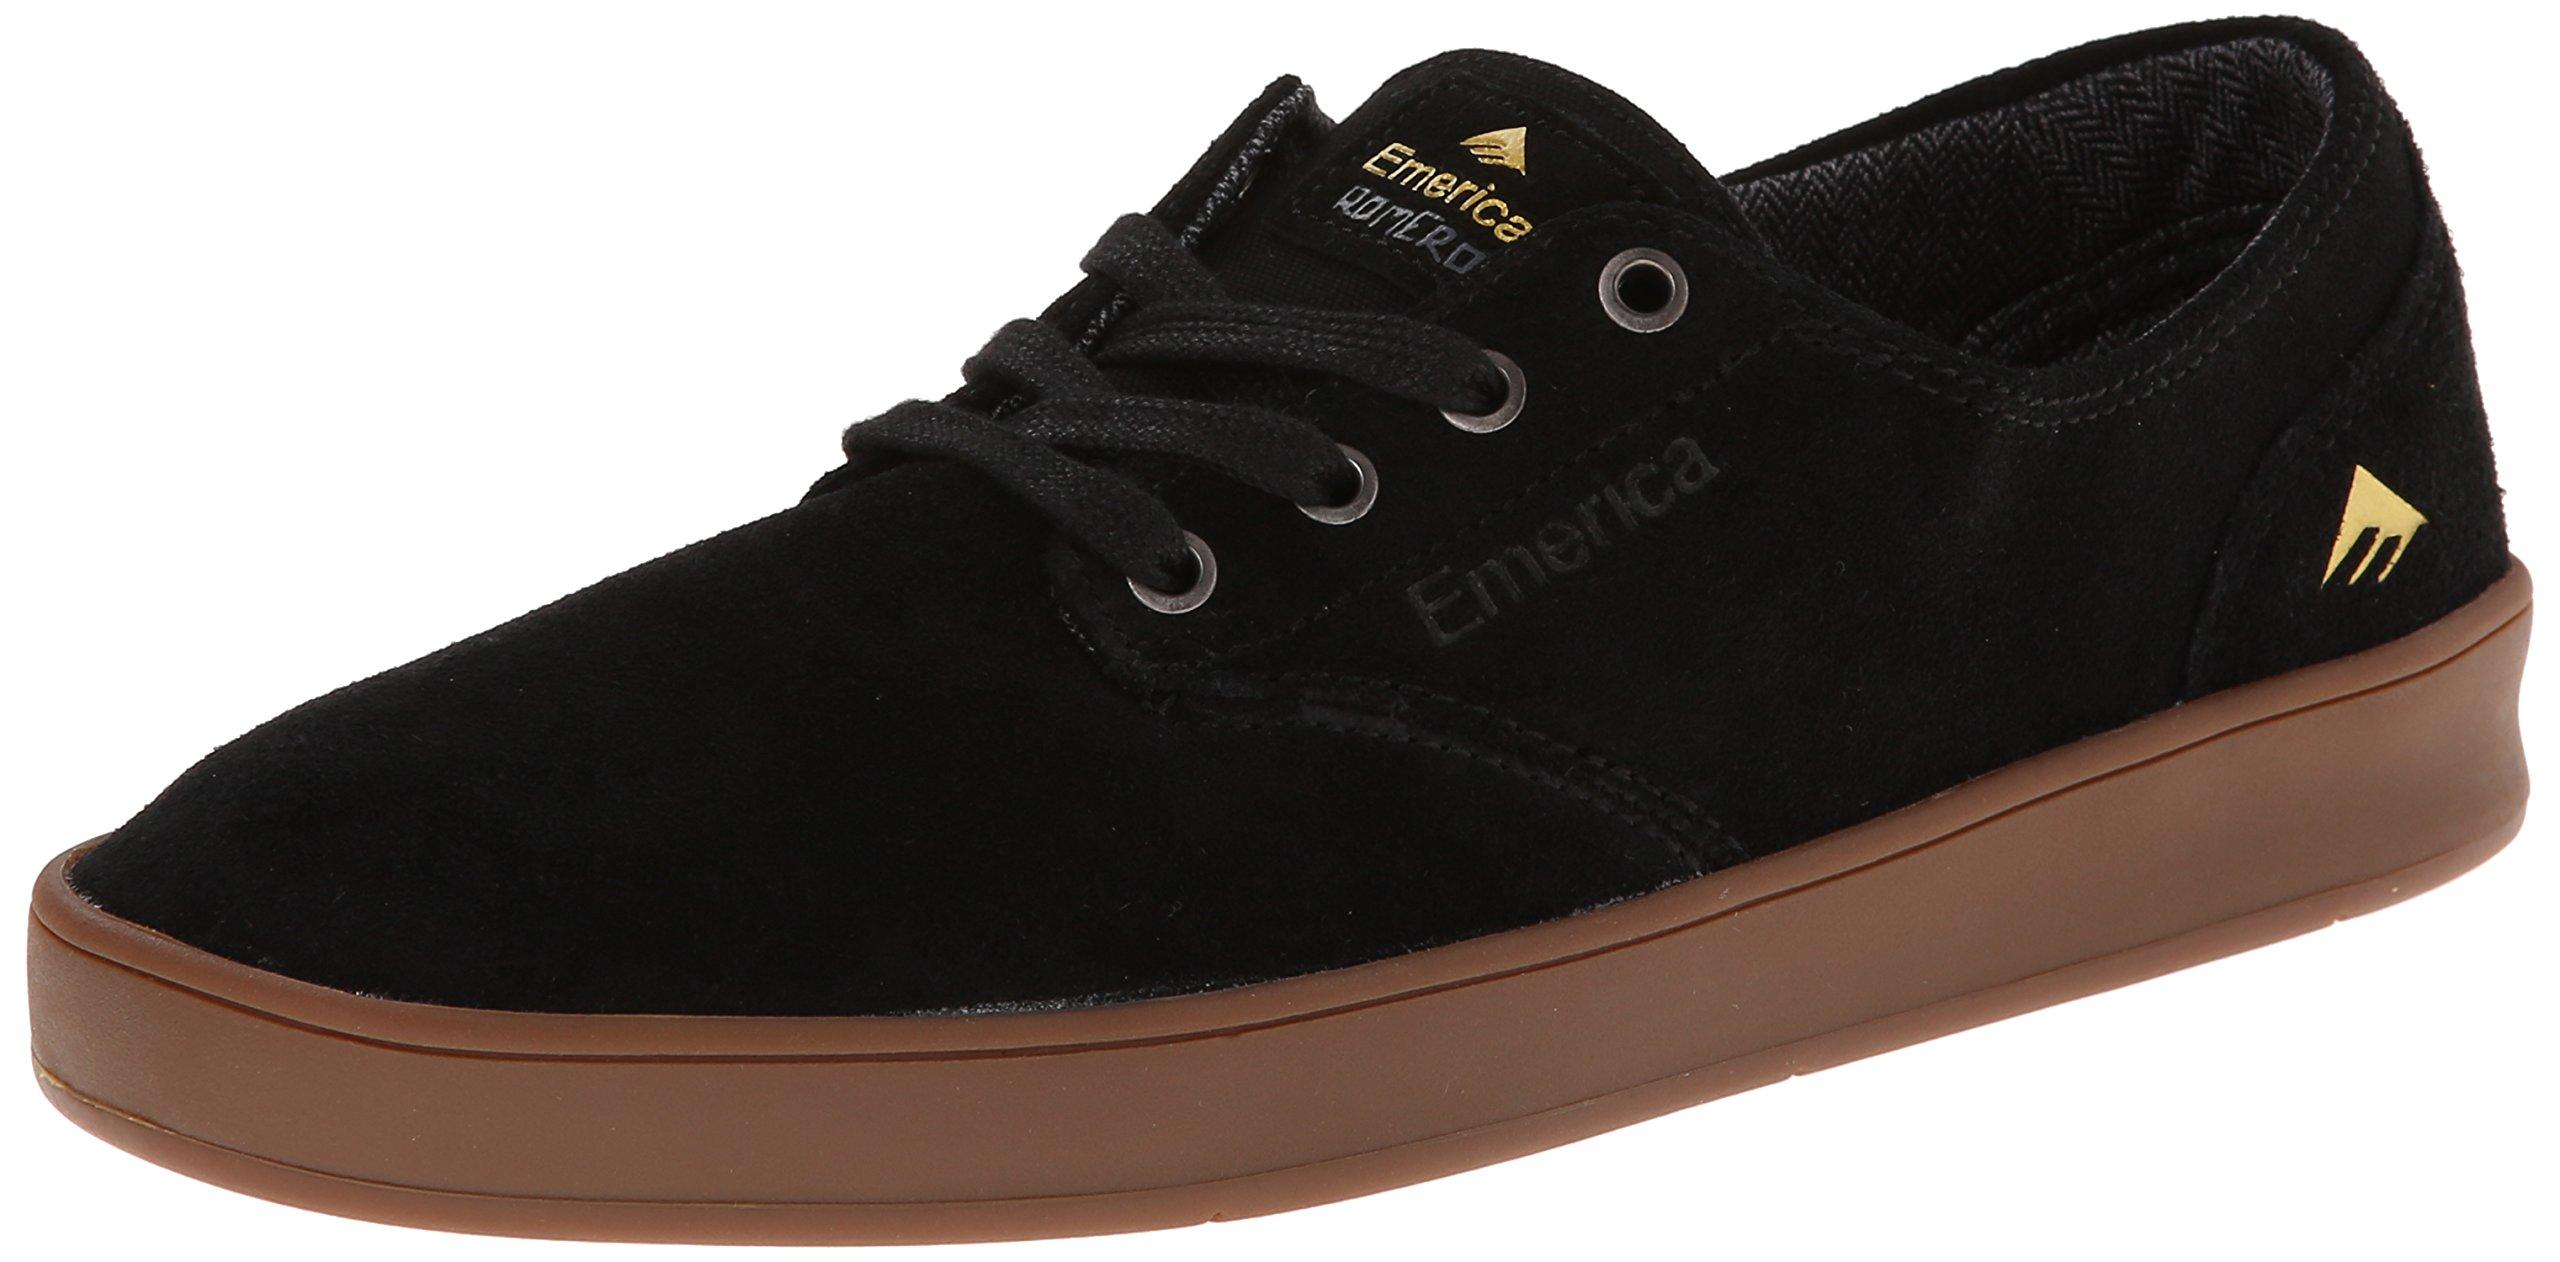 Emerica Romero Laced Skateboarding Black